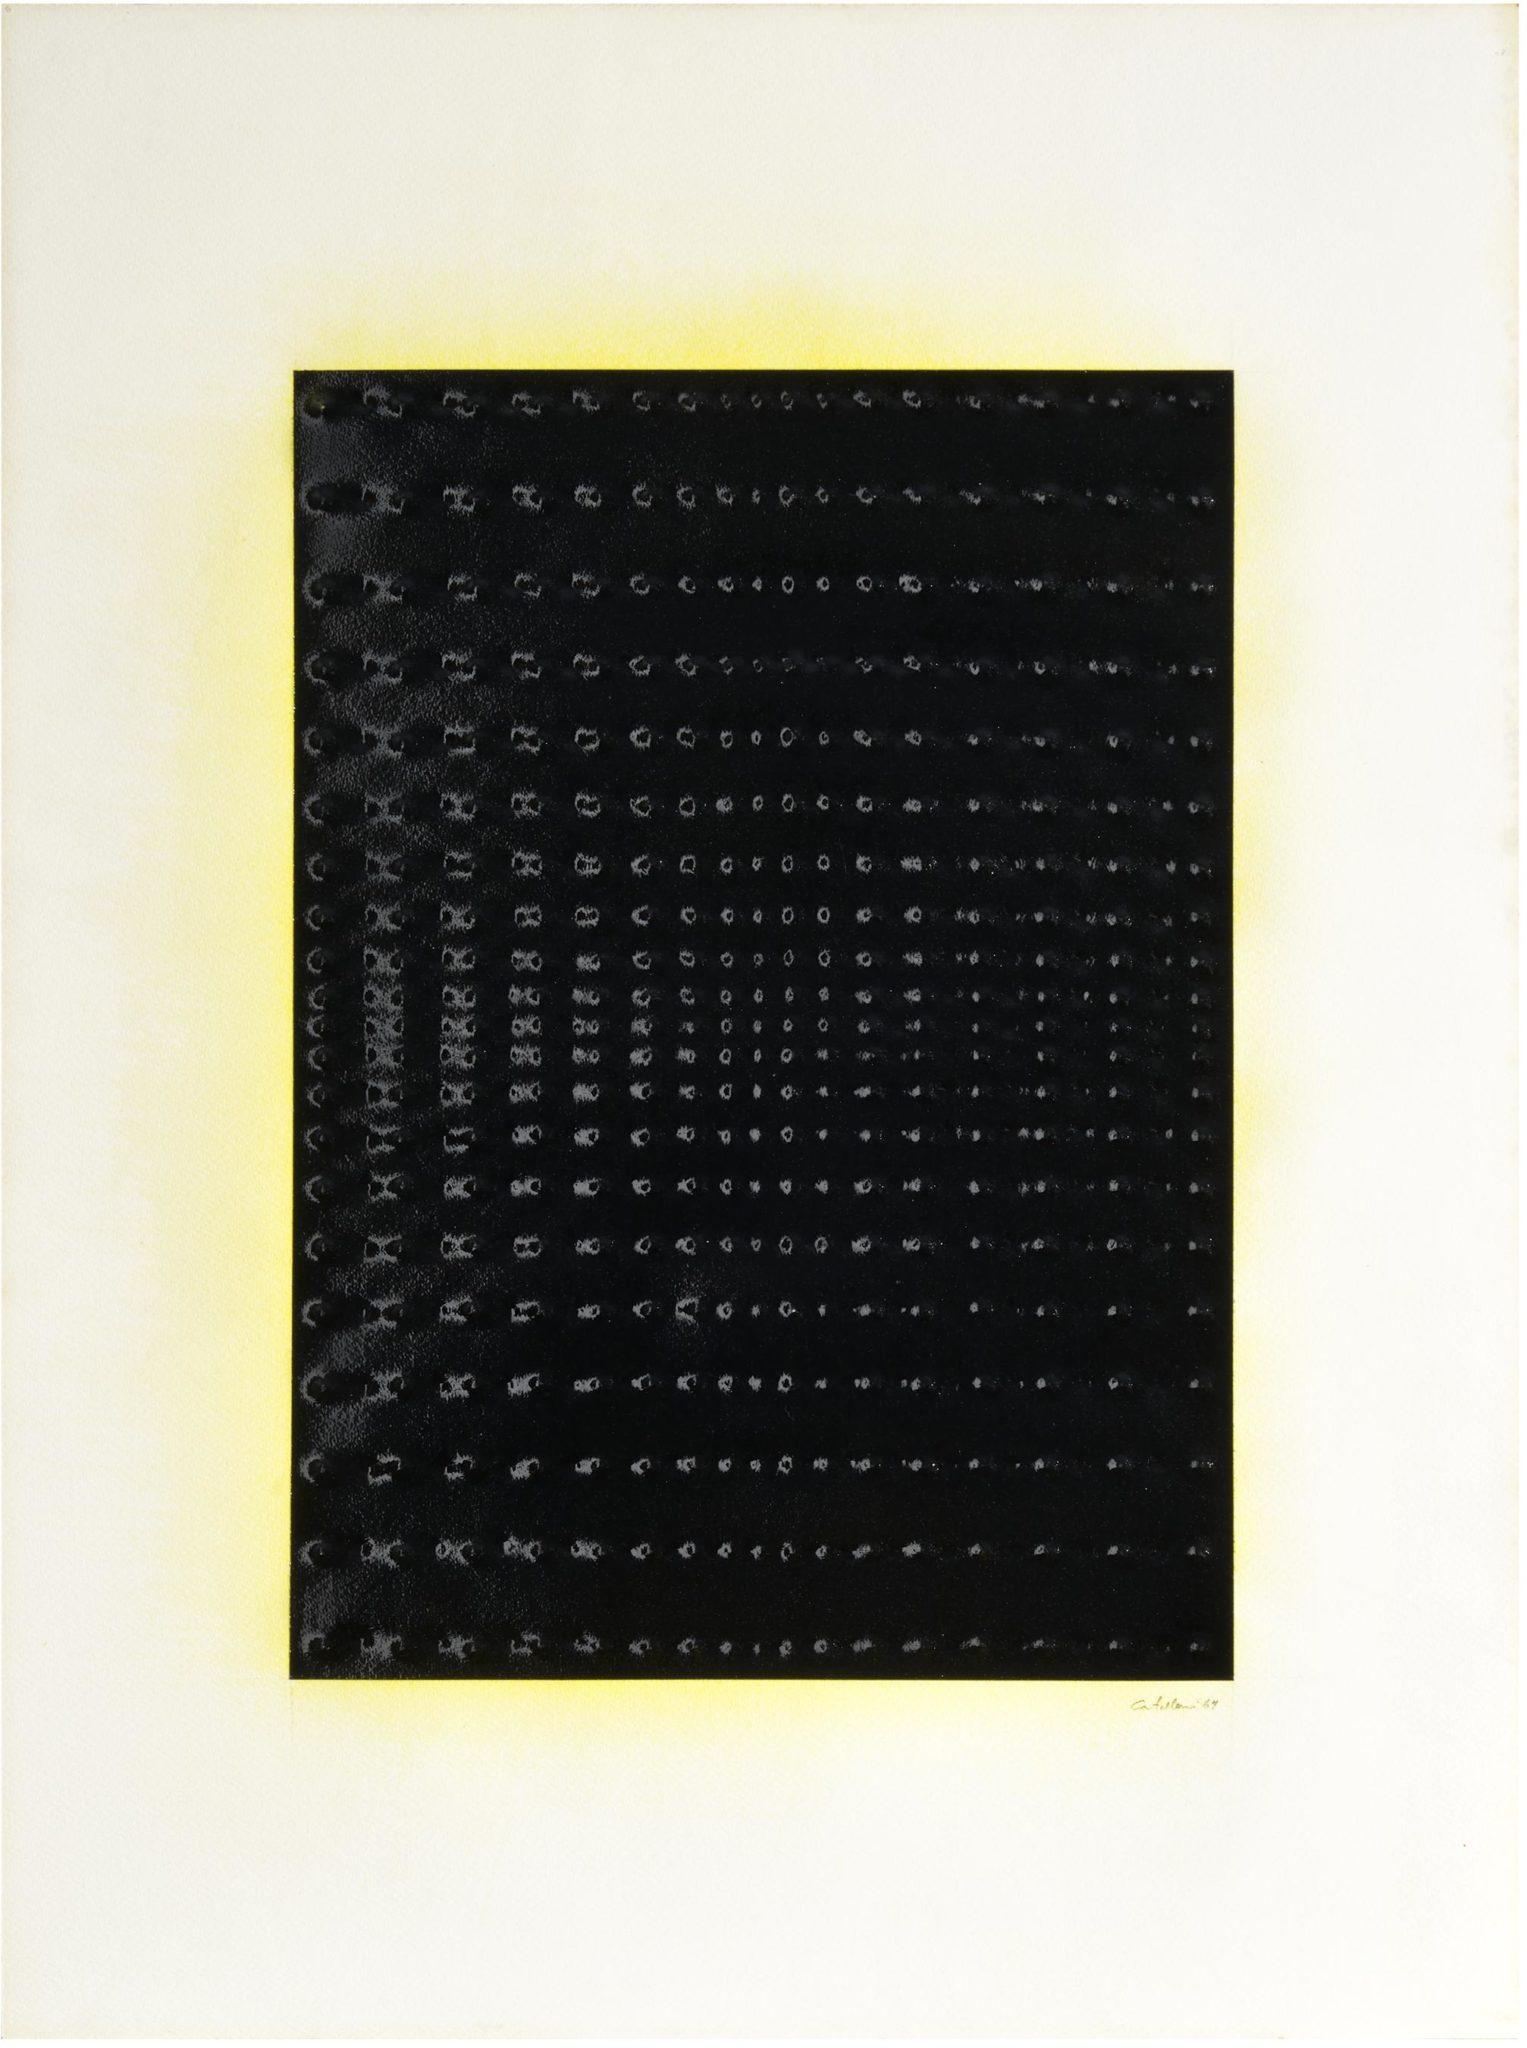 Enrico Castellani - Superficie blu, 1967